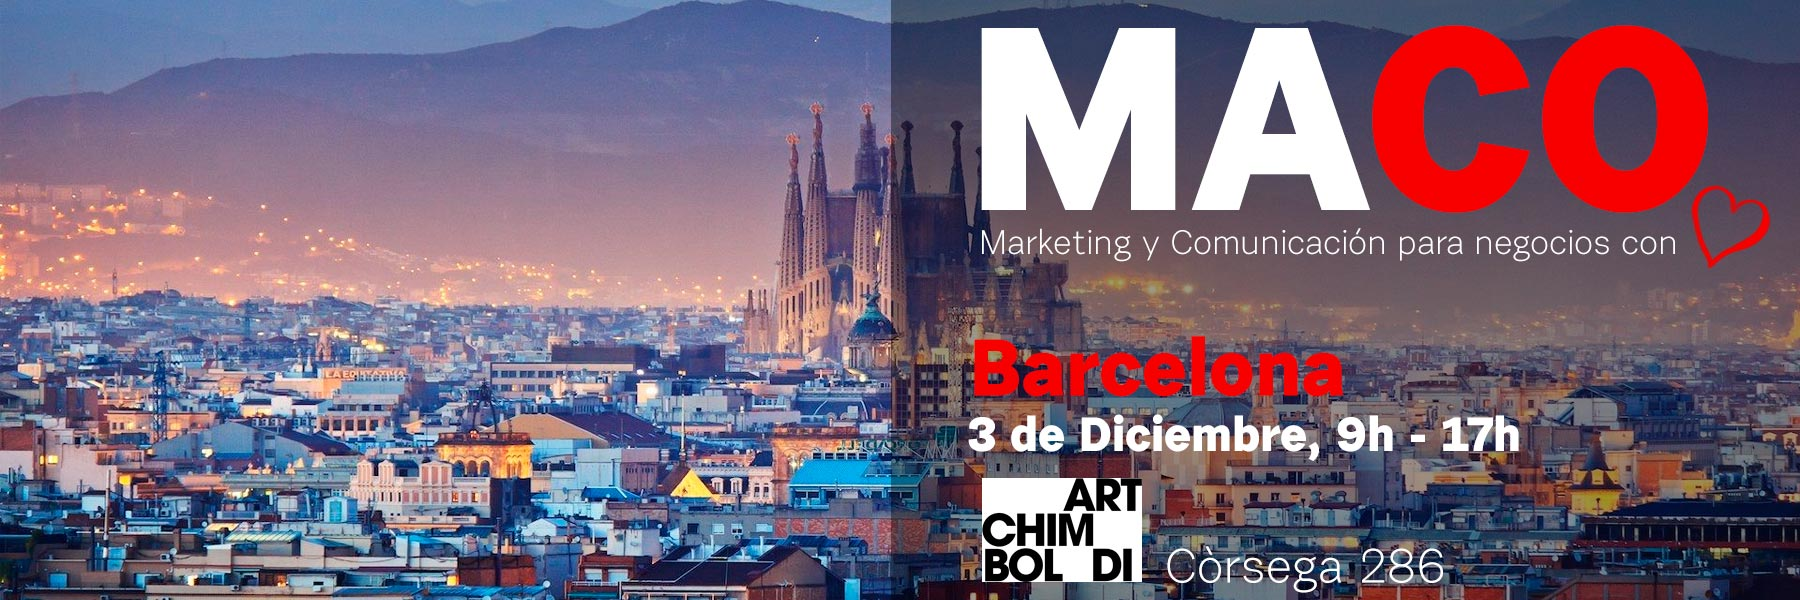 MACO Barcelona